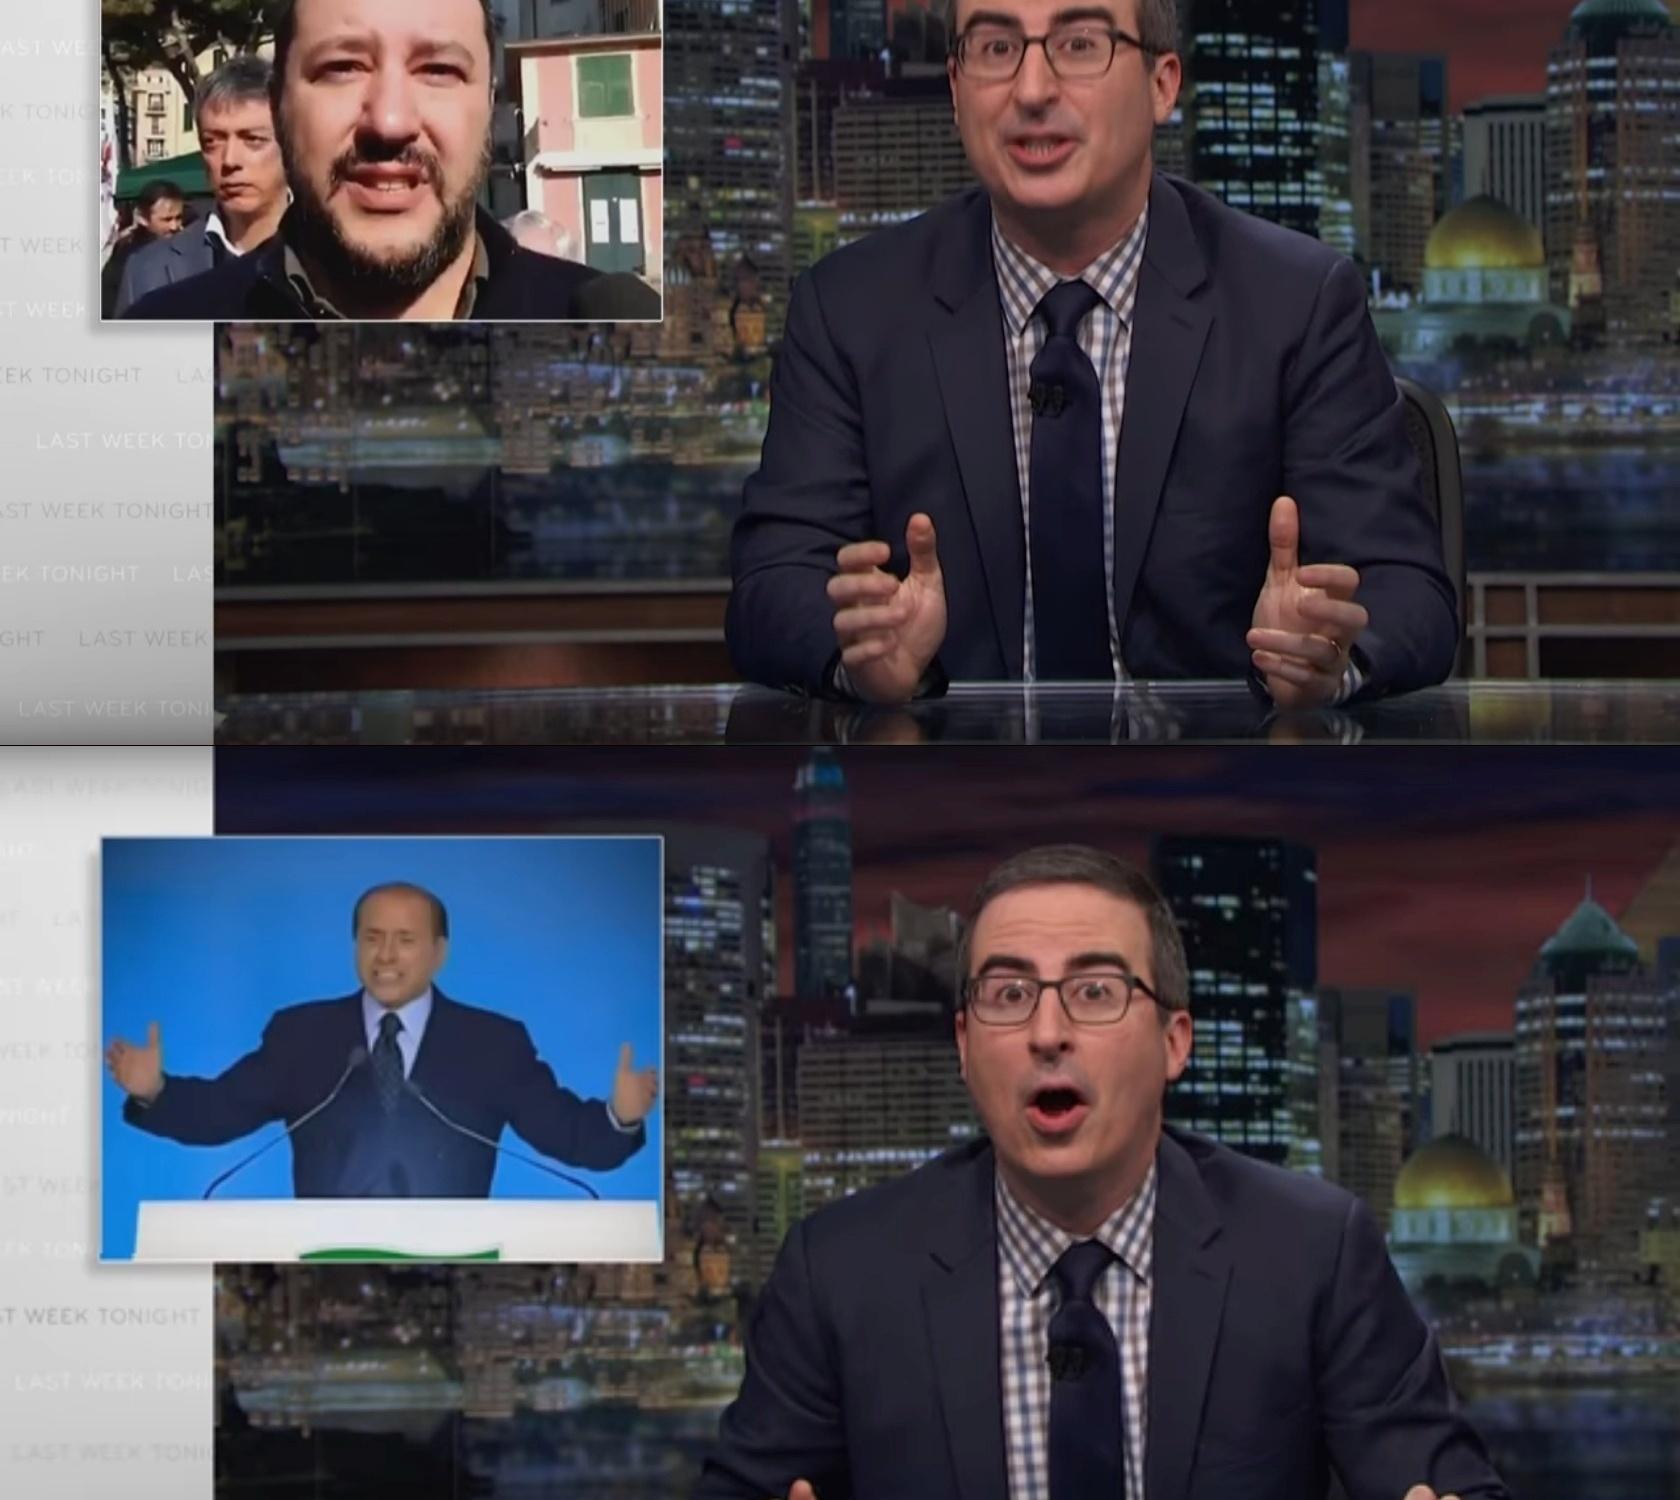 Le elezioni italiane viste da John Oliver